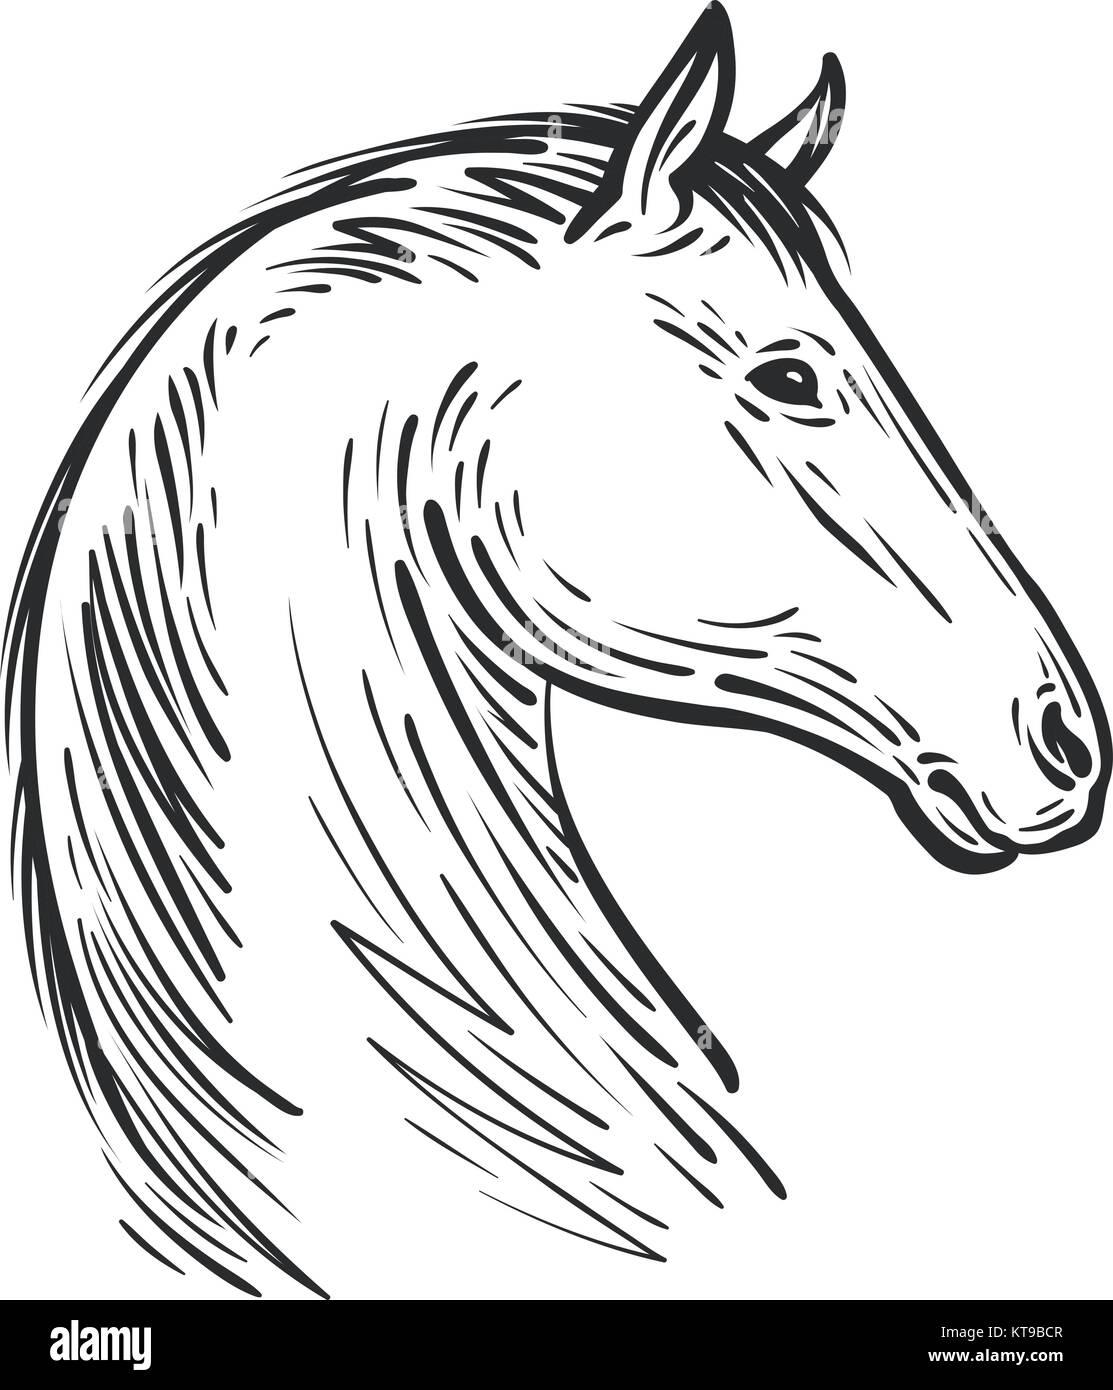 Horse sketch. Farm animal, steed vector illustration - Stock Vector